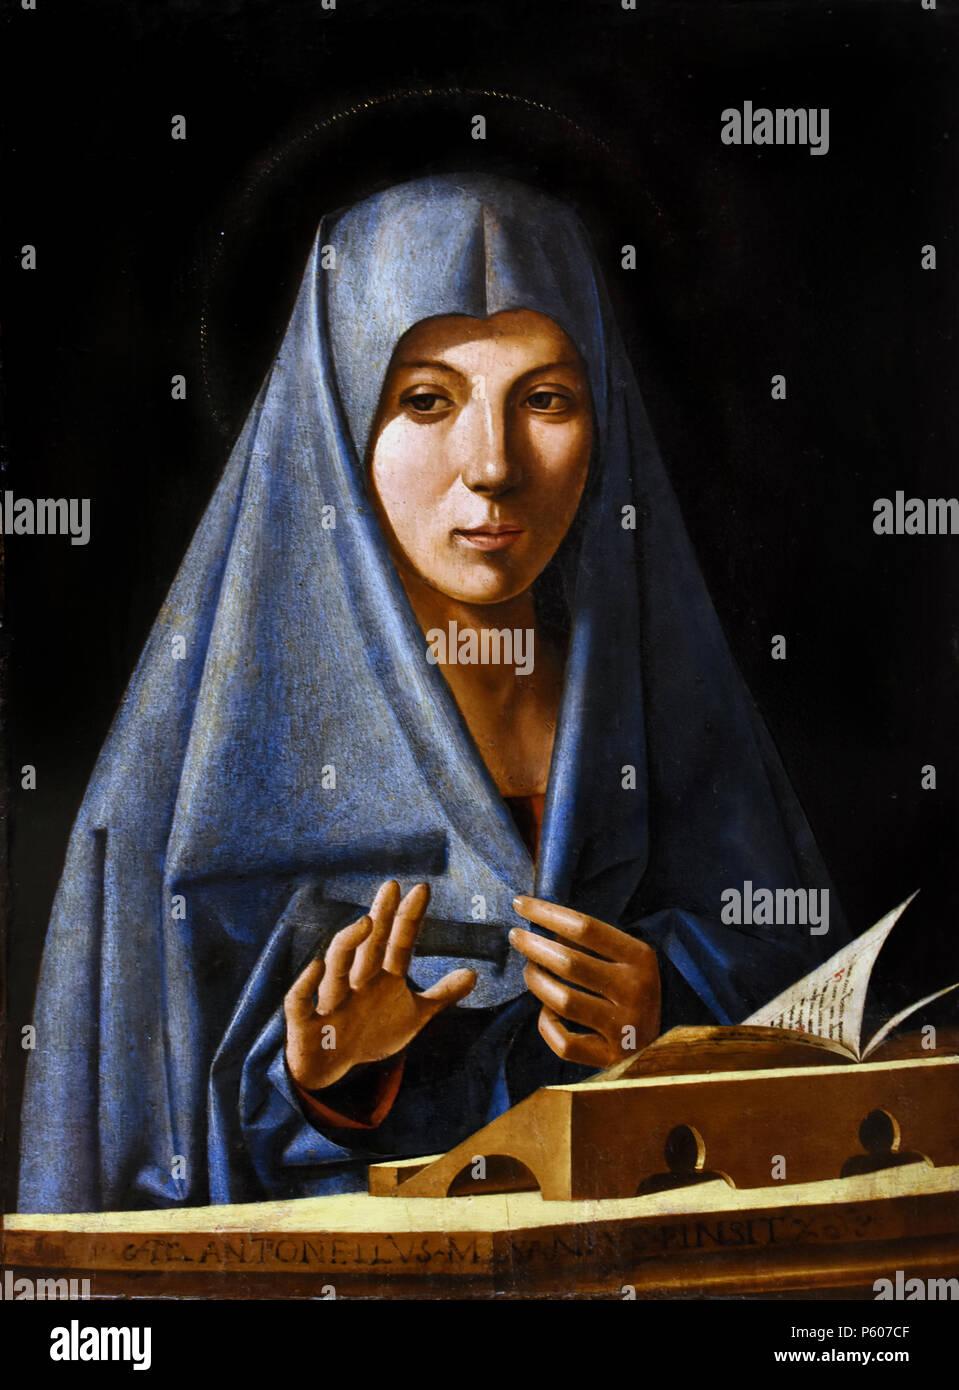 Announced by Antonello de Saliba (Messina, 1467  - 1535 ), Italy, Italian, - Stock Image